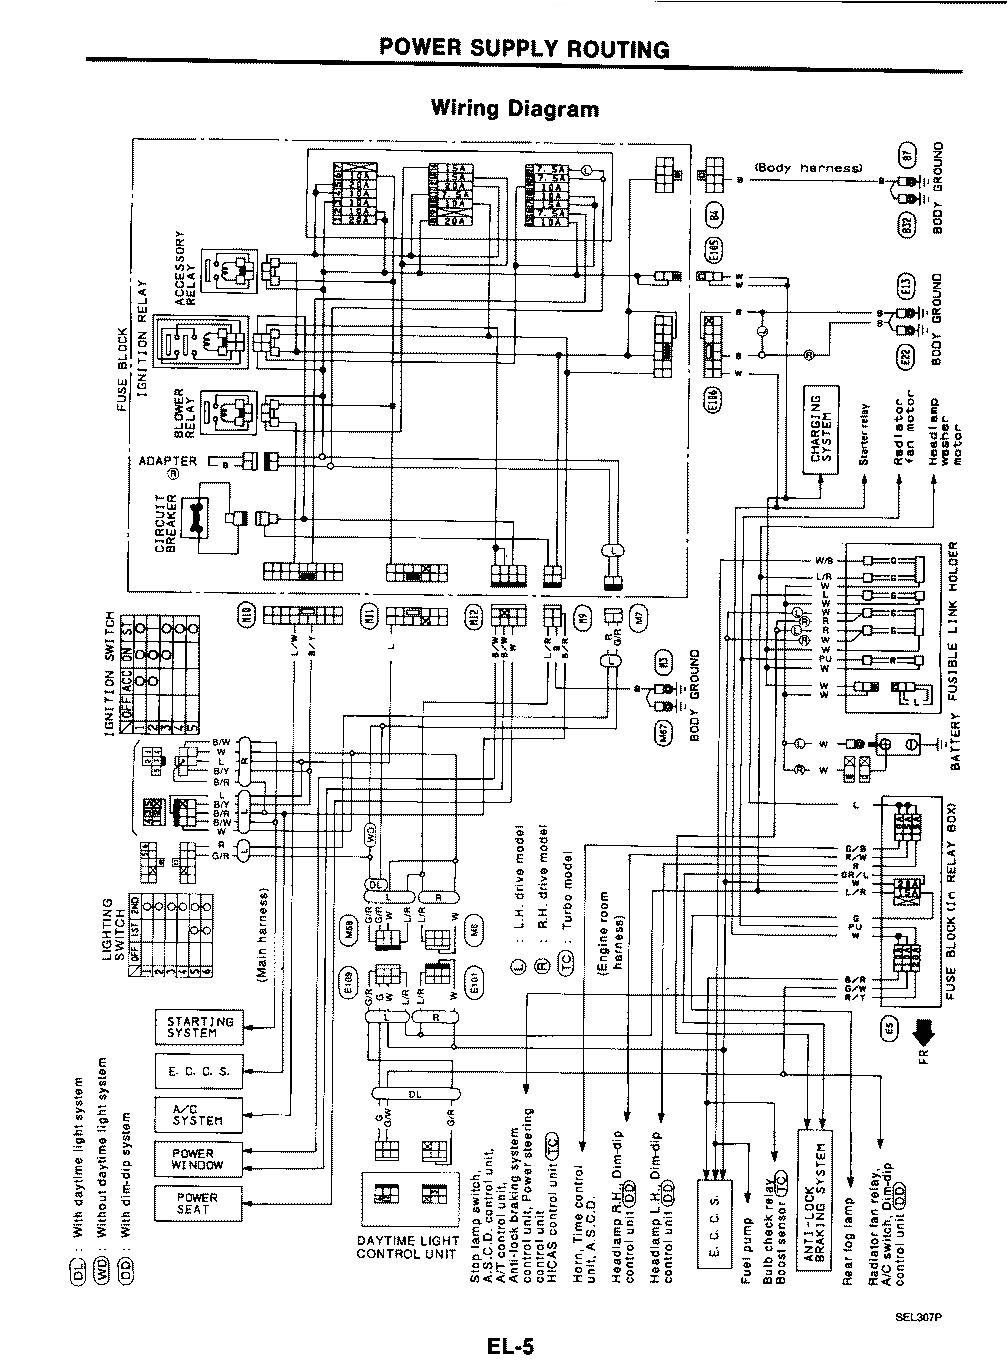 dim and bright wiring diagram autocardesign. Black Bedroom Furniture Sets. Home Design Ideas